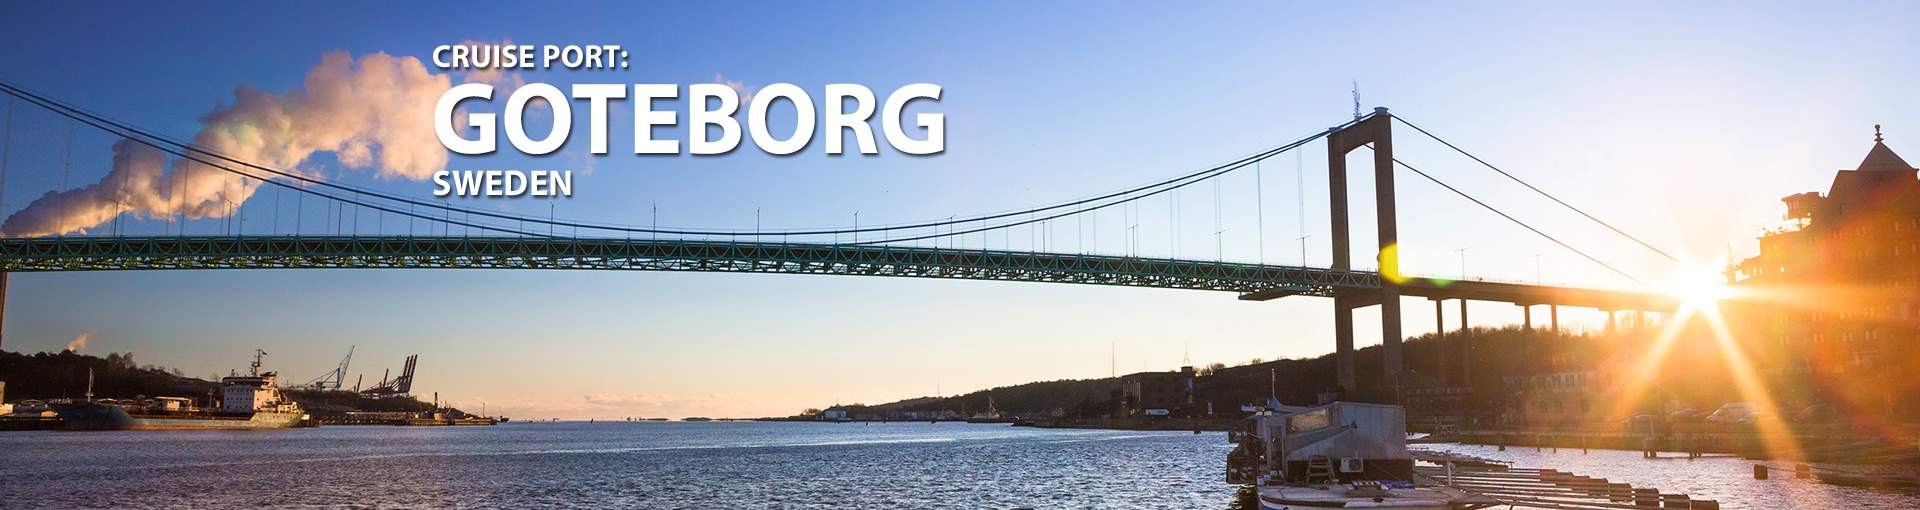 Cruises to Goteborg, Sweden